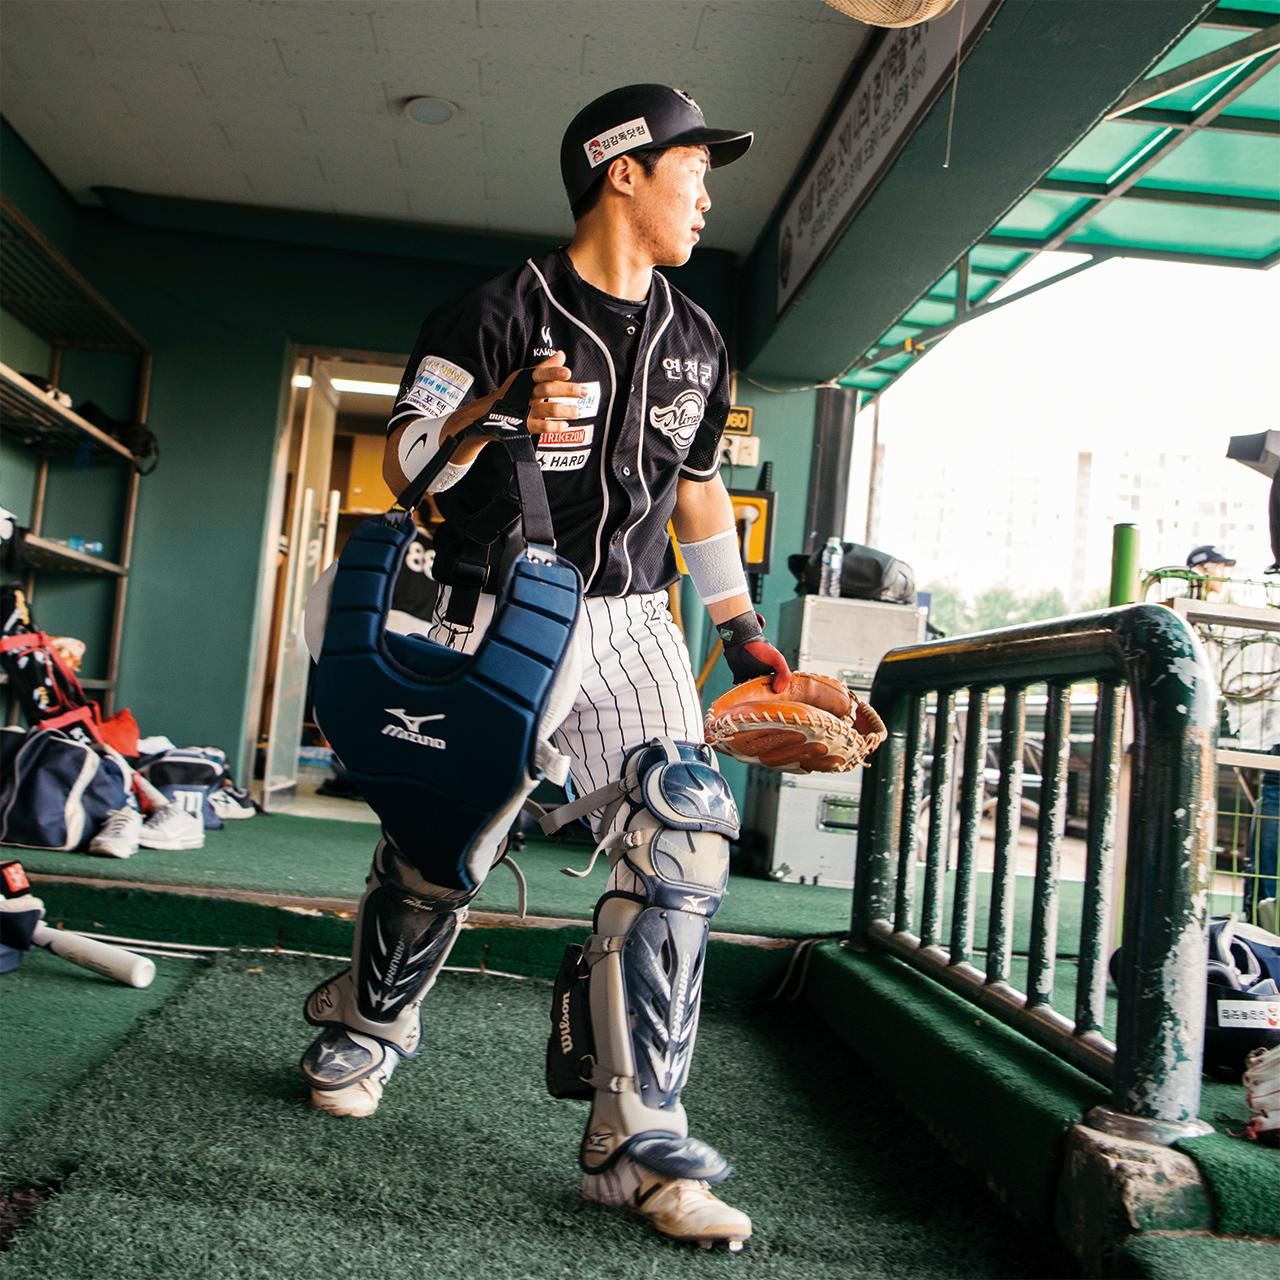 "<strong>신승원(26번, 1994년생), 포수</strong><br/>""프로에 가는 게 목표가 아니에요. 바로 1군에 들어갈 실력을 쌓는 게 목표입니다. 야구는 제 인생의 전부예요. 어릴 때부터 그랬어요."""